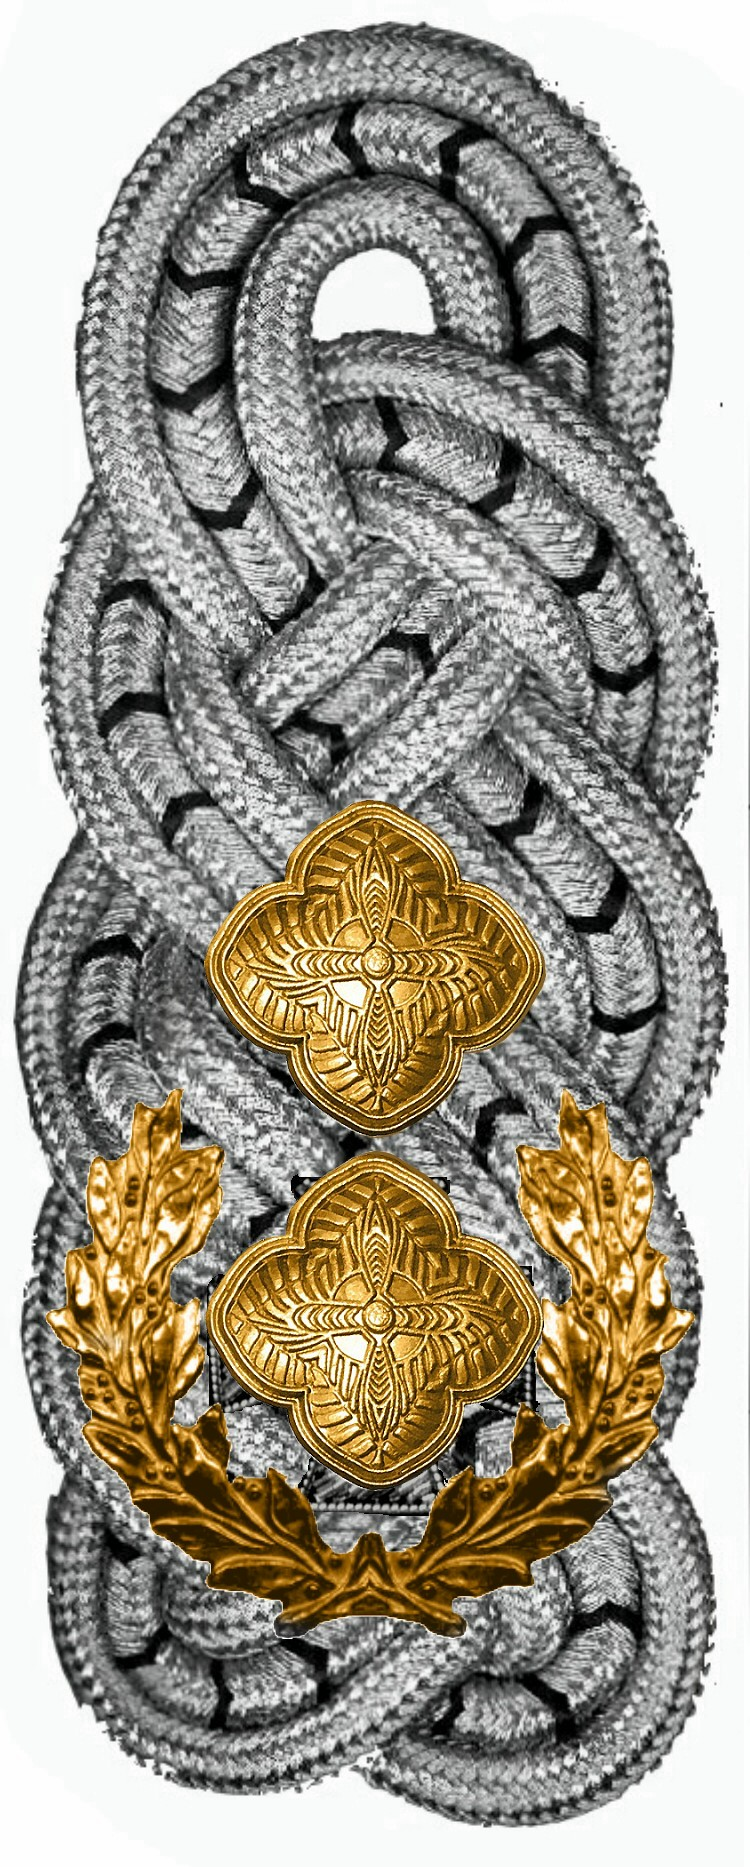 gala-commanding-sergant-major